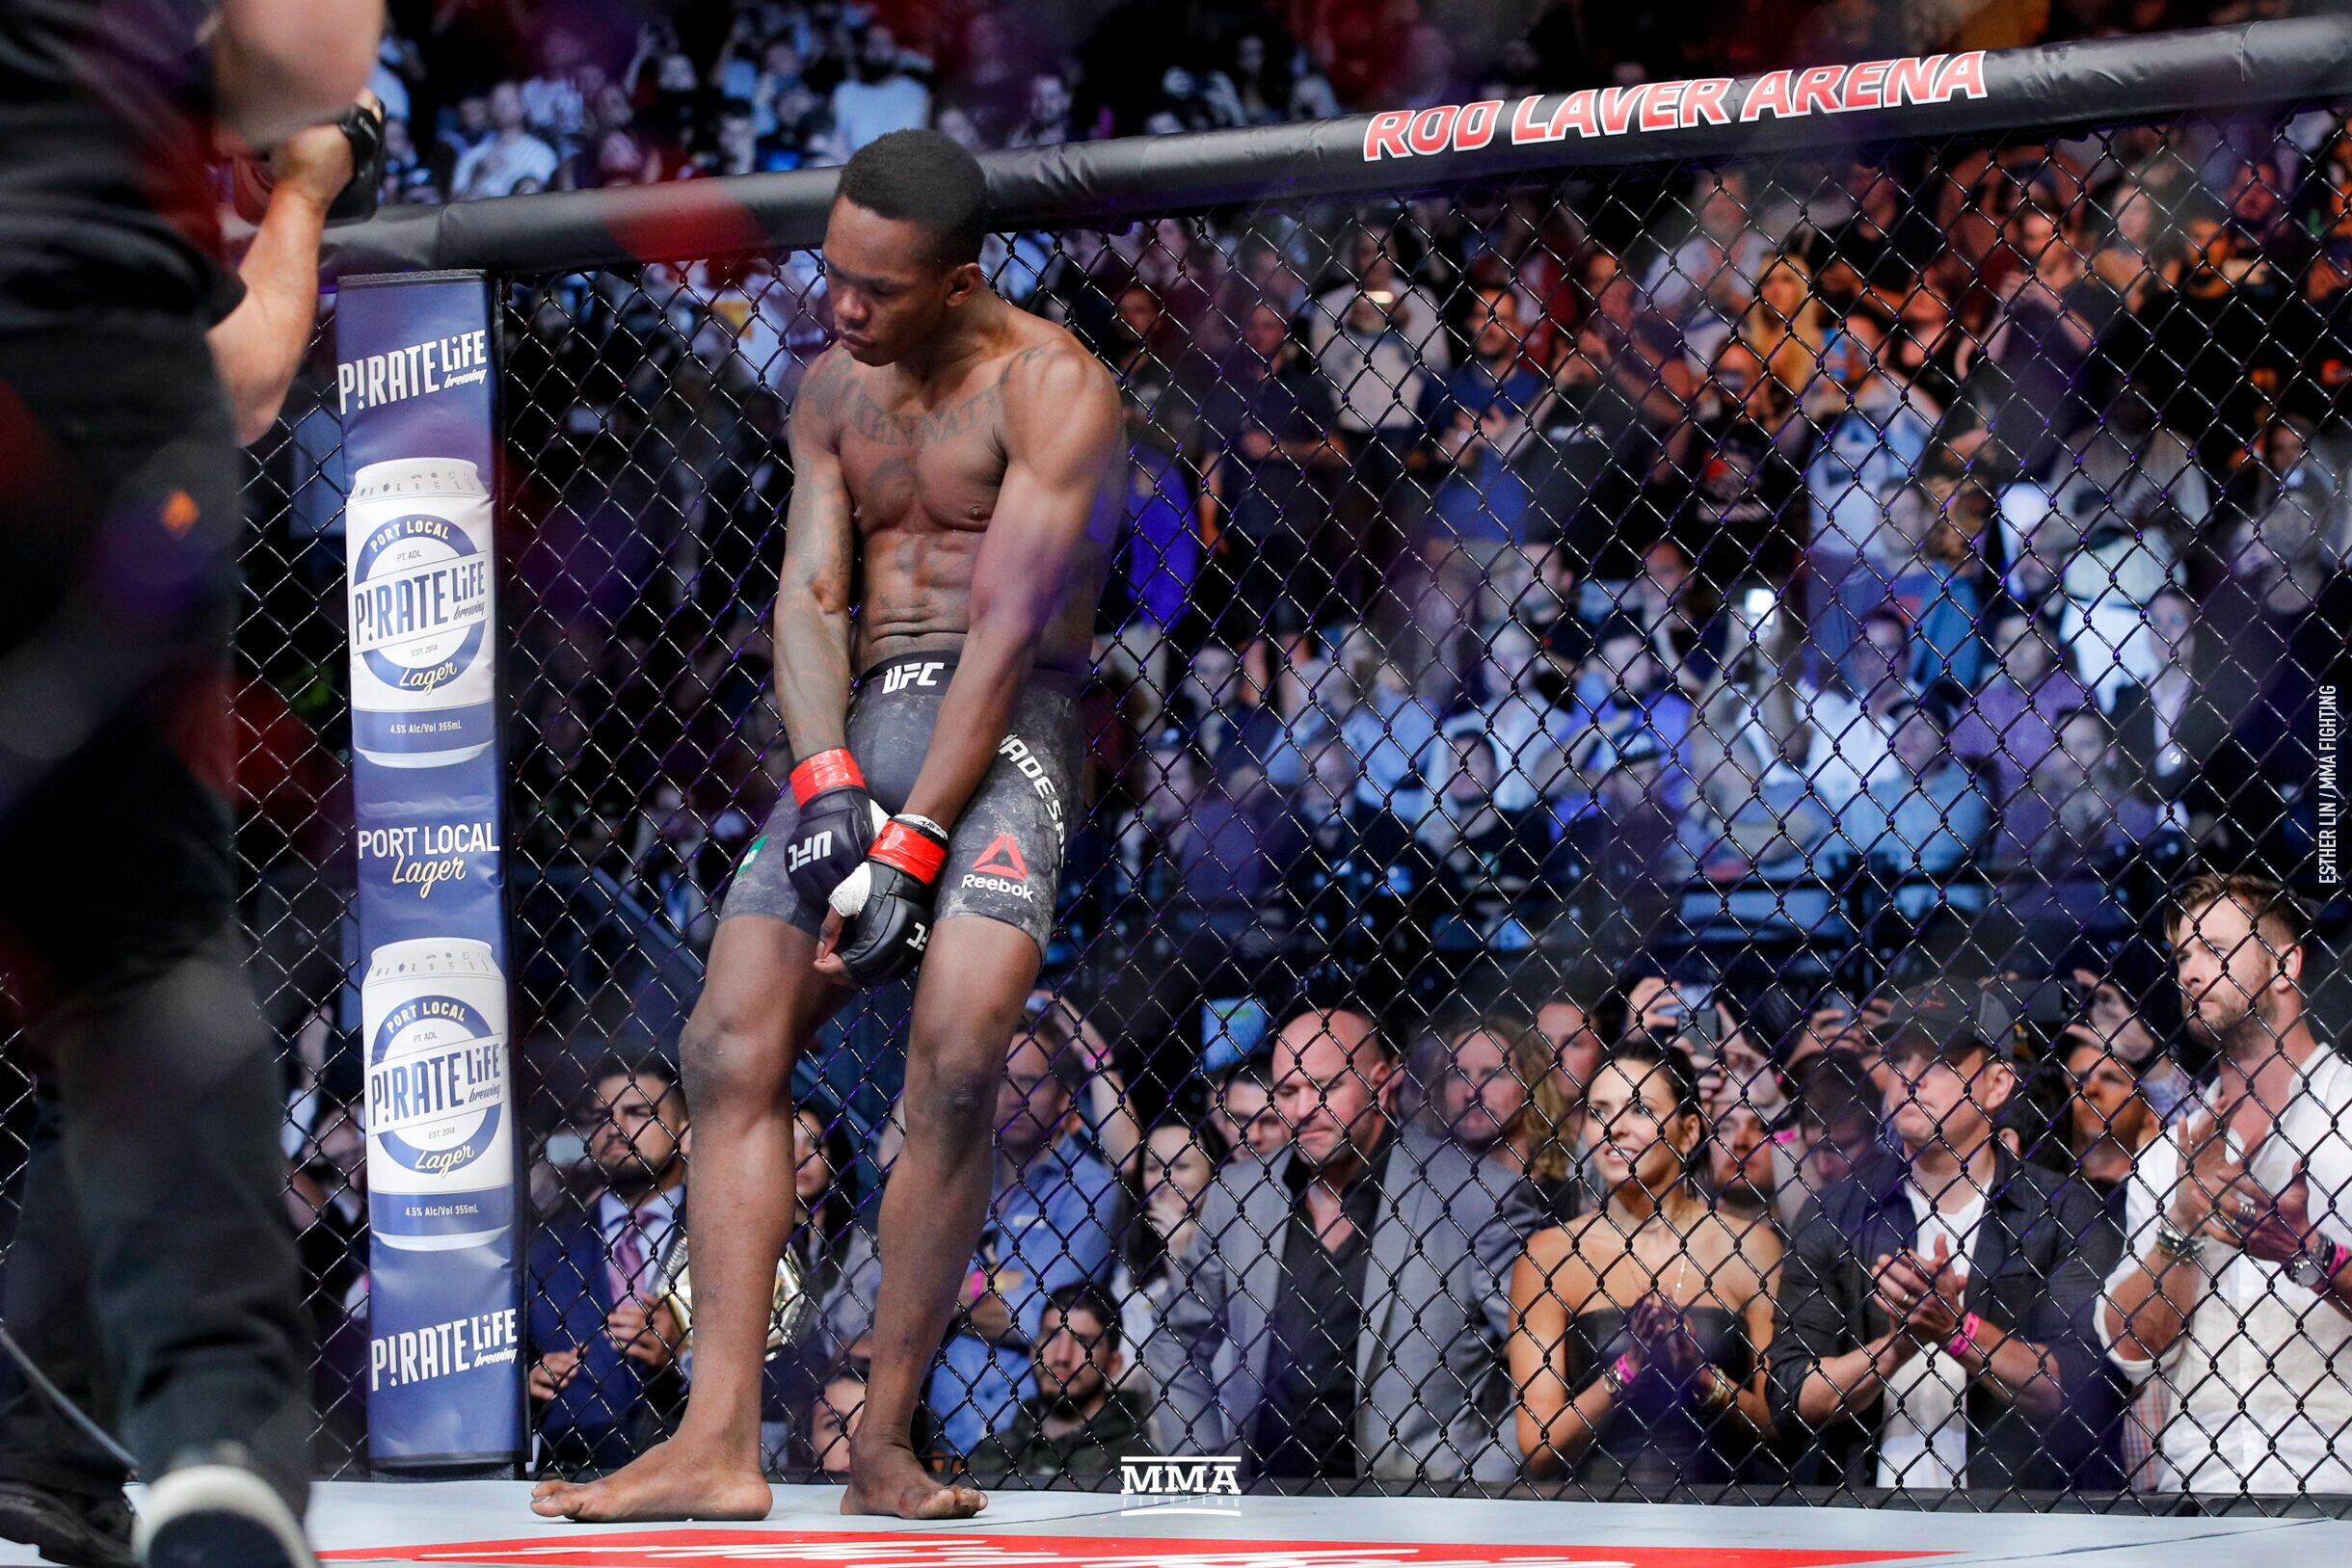 UFC 234 results: Next matches to make for 'Silva vs Adesanya' main